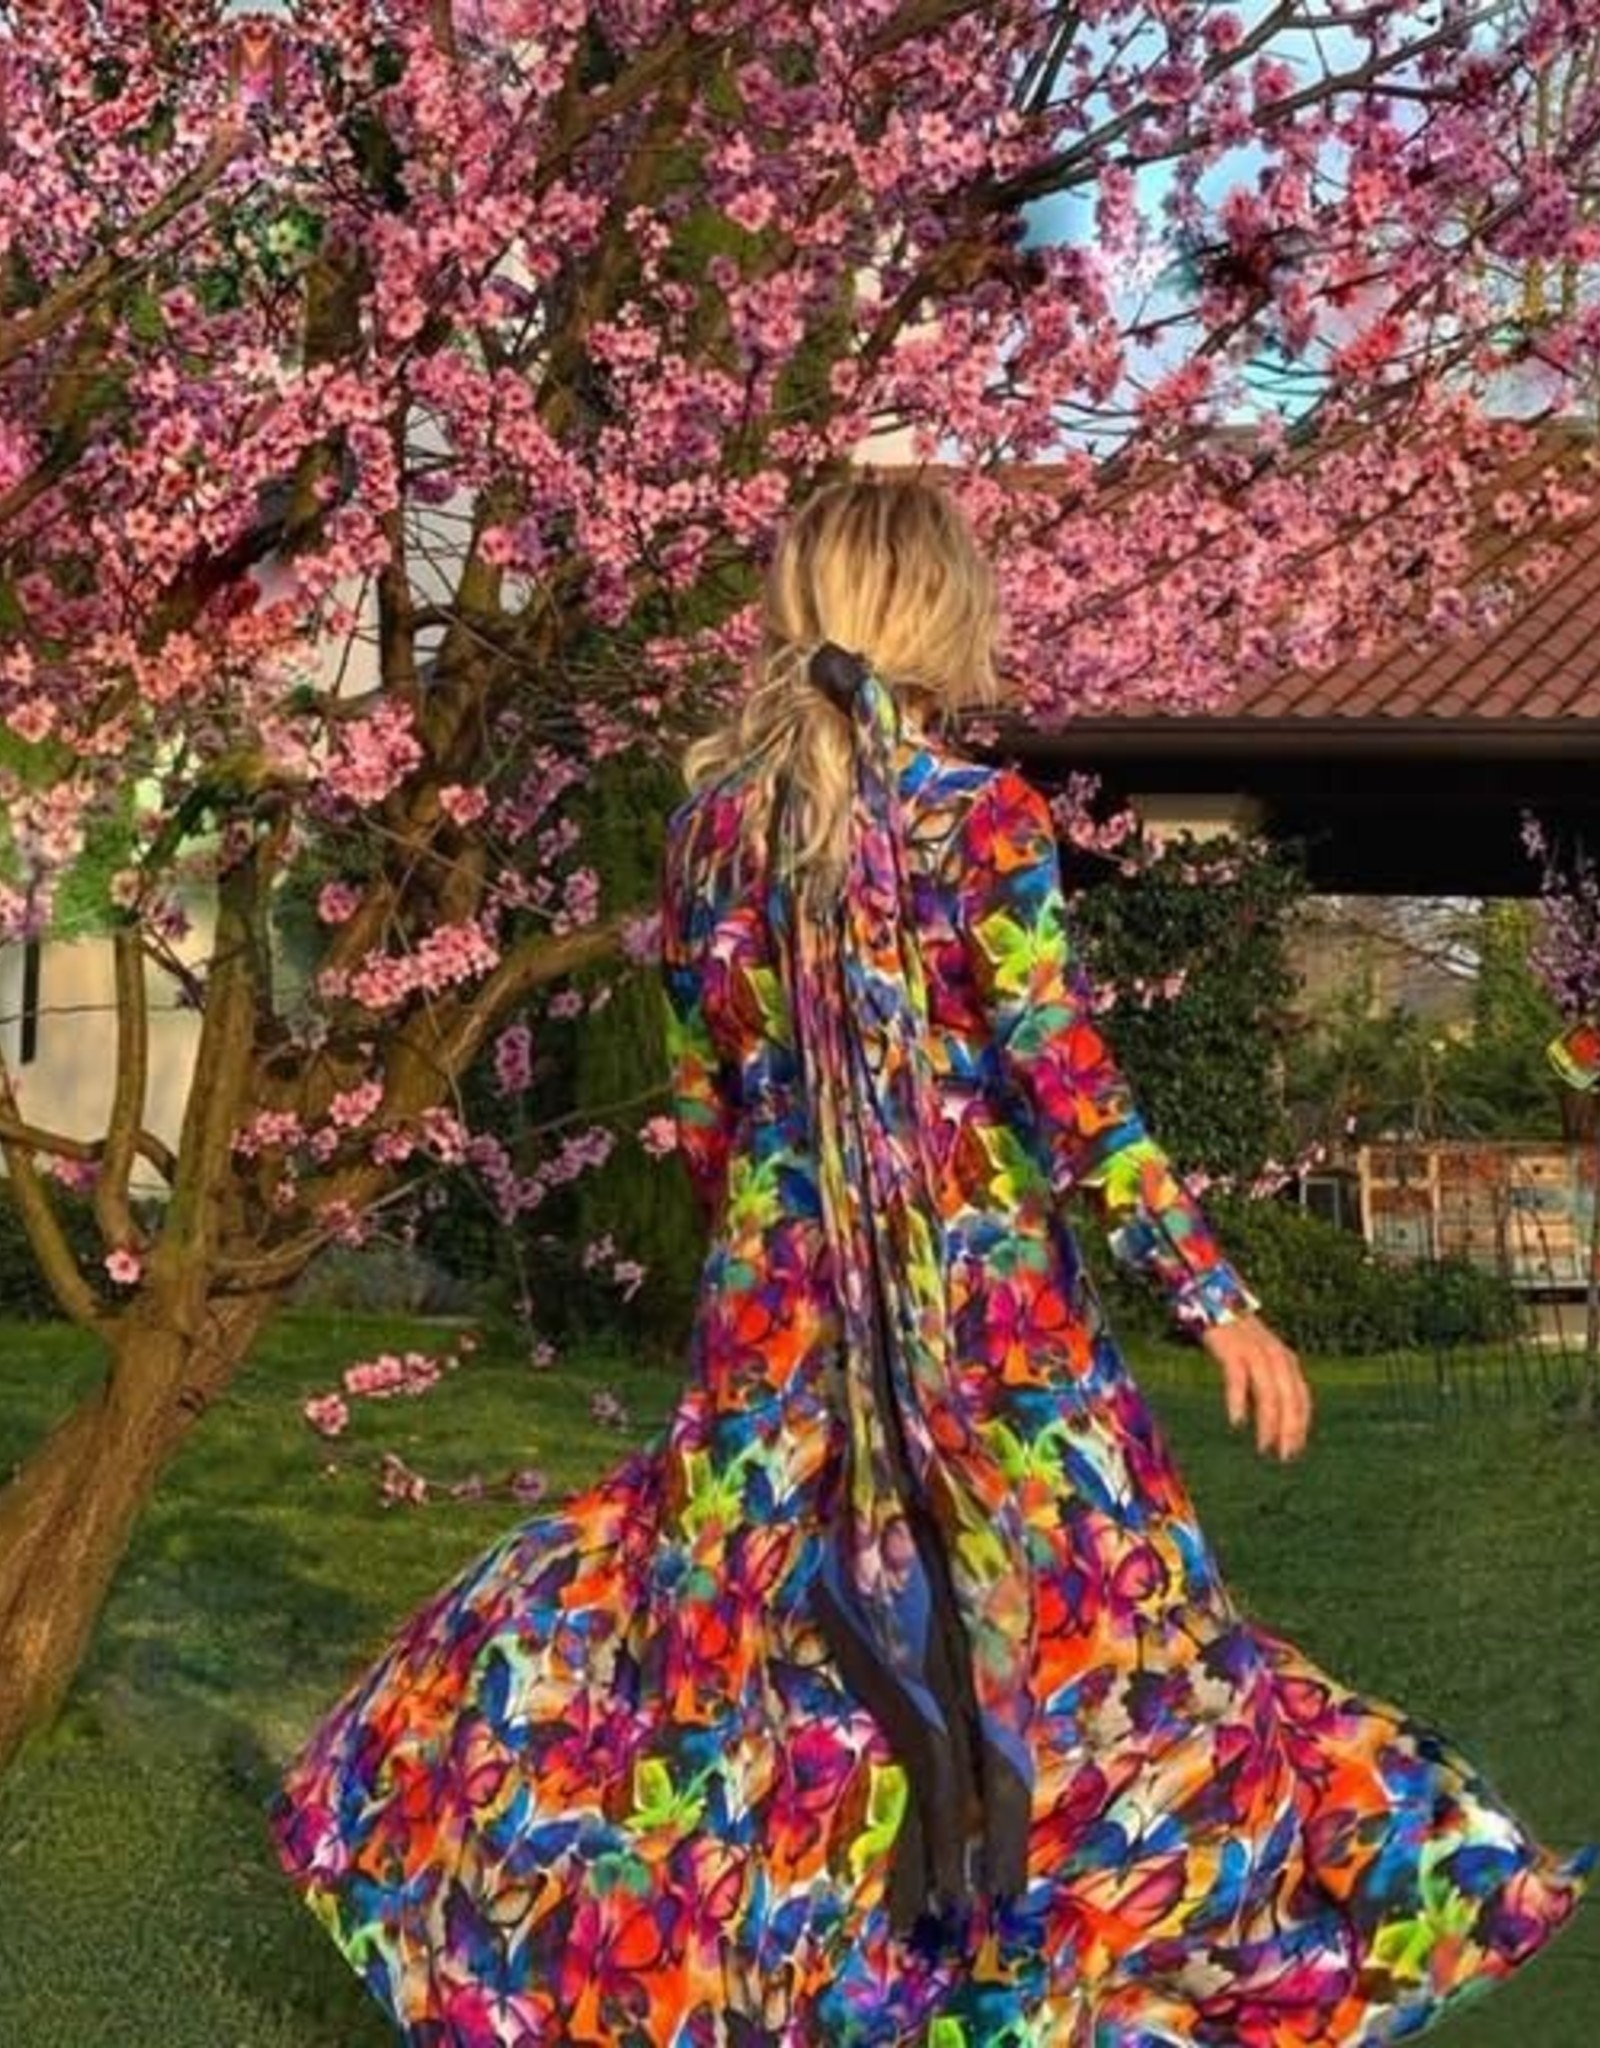 OTTOTREDICI DI ANNALISA GIUNTINI - Lucrezia Dress